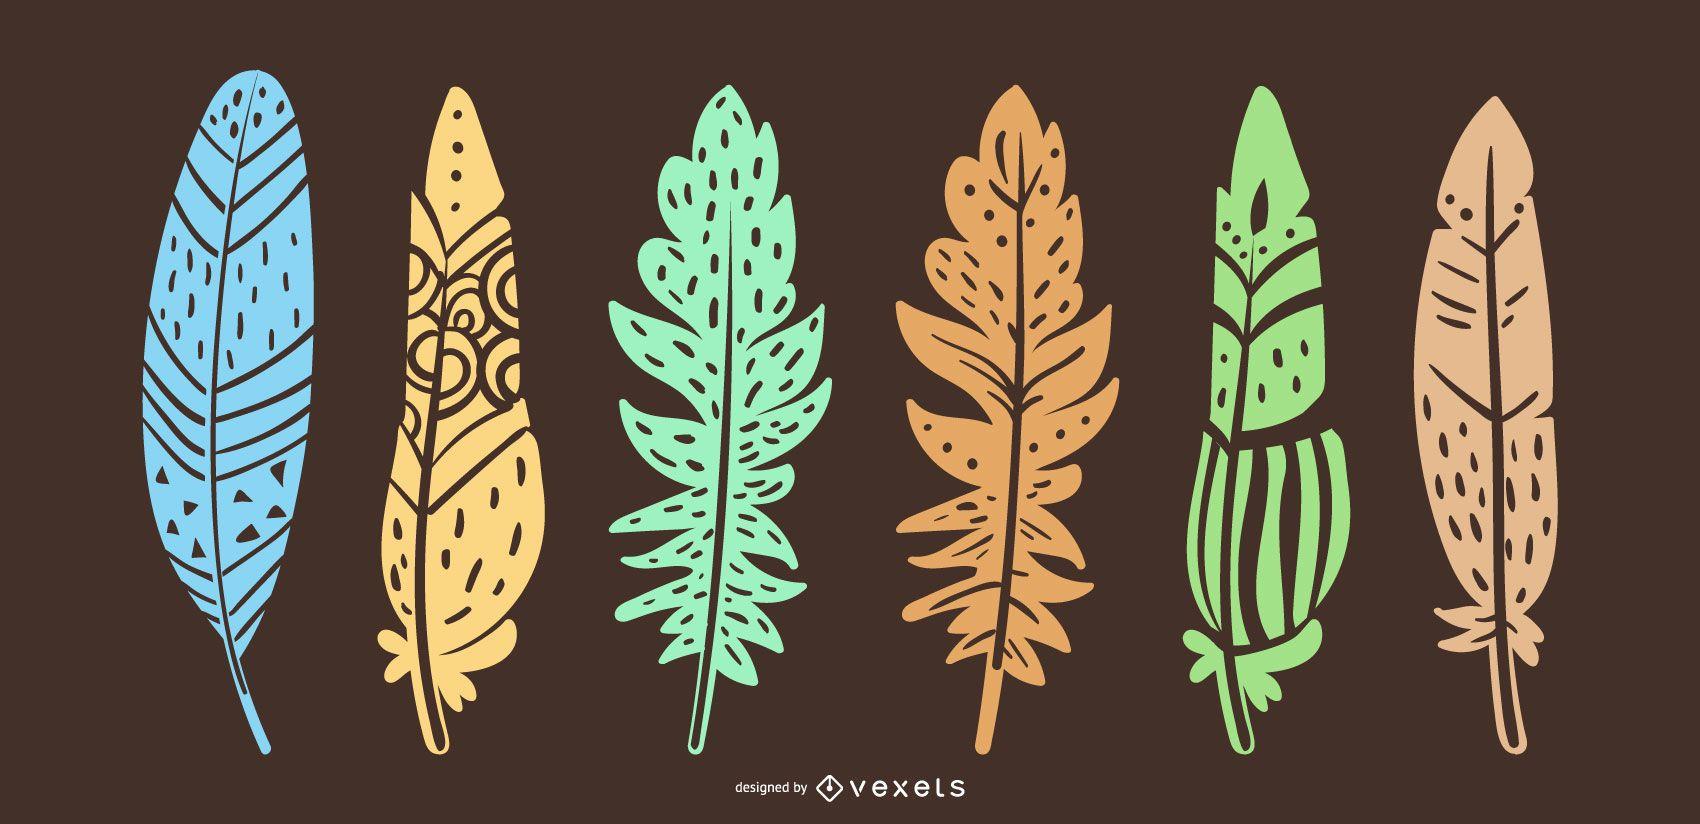 Vibrant Feather Design Illustration